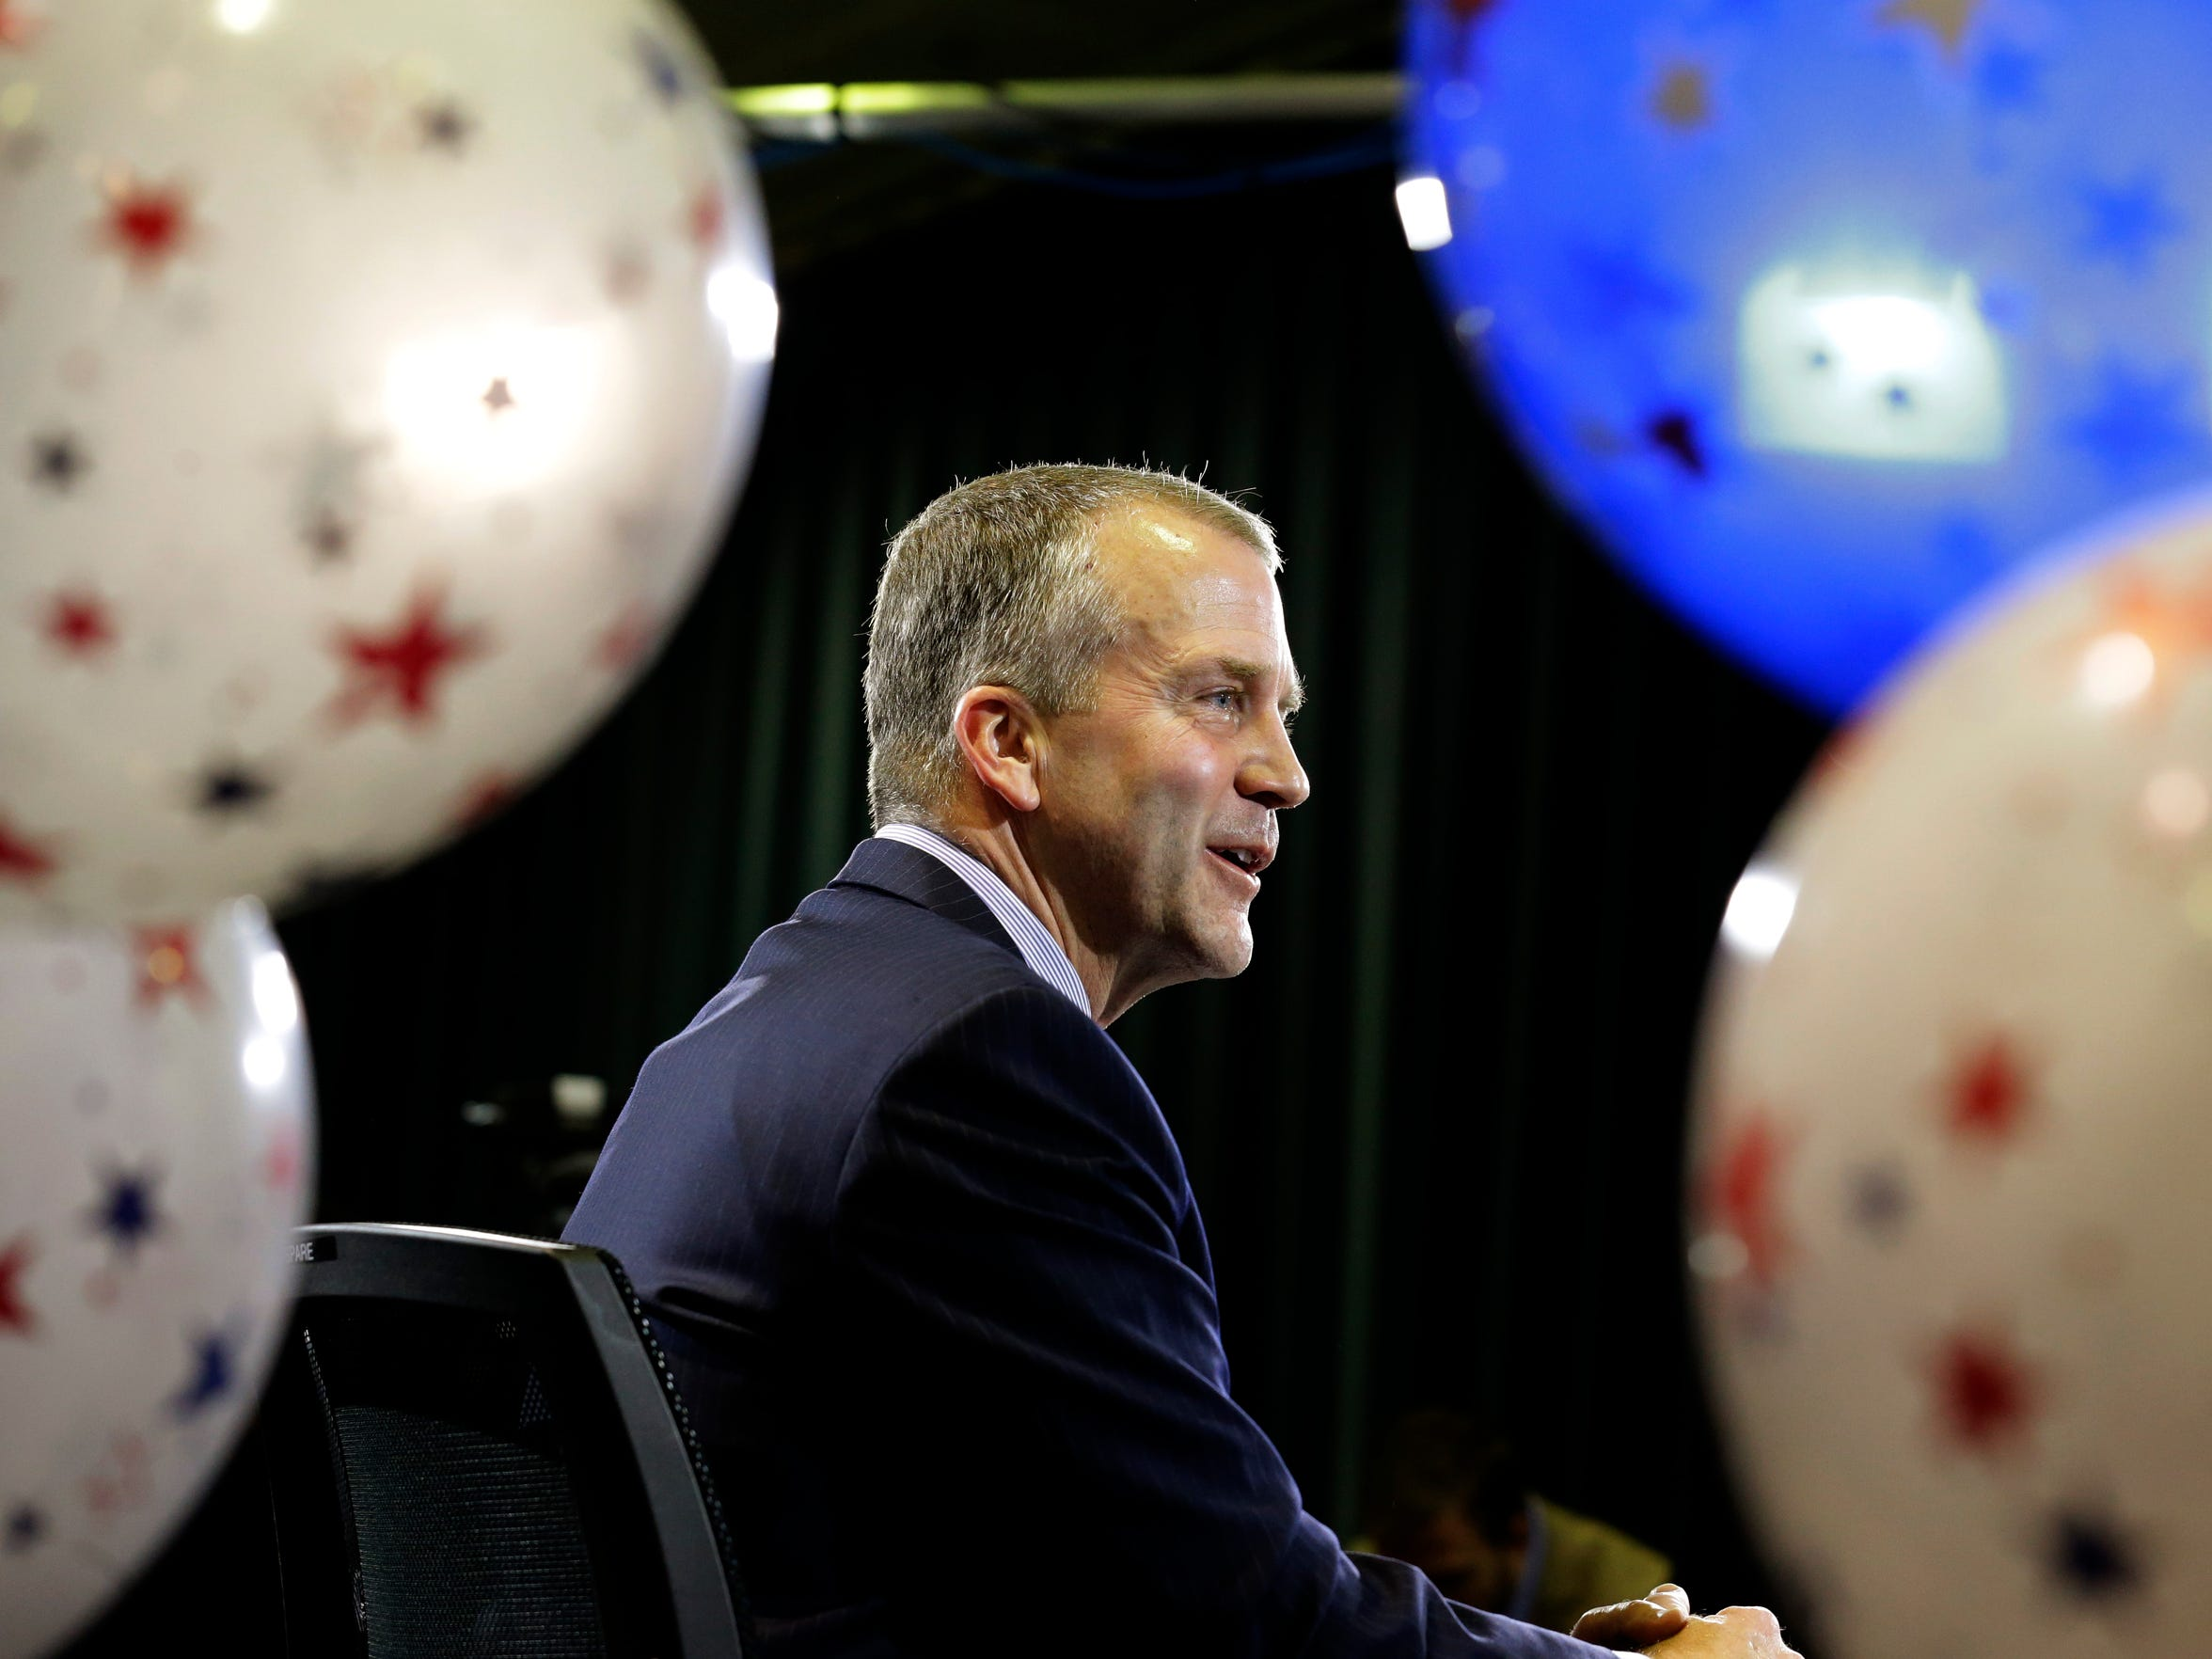 Republican U.S. Senate candidate Dan Sullivan takes part in a television interview on Nov. 4, 2014, in Anchorage Alaska.